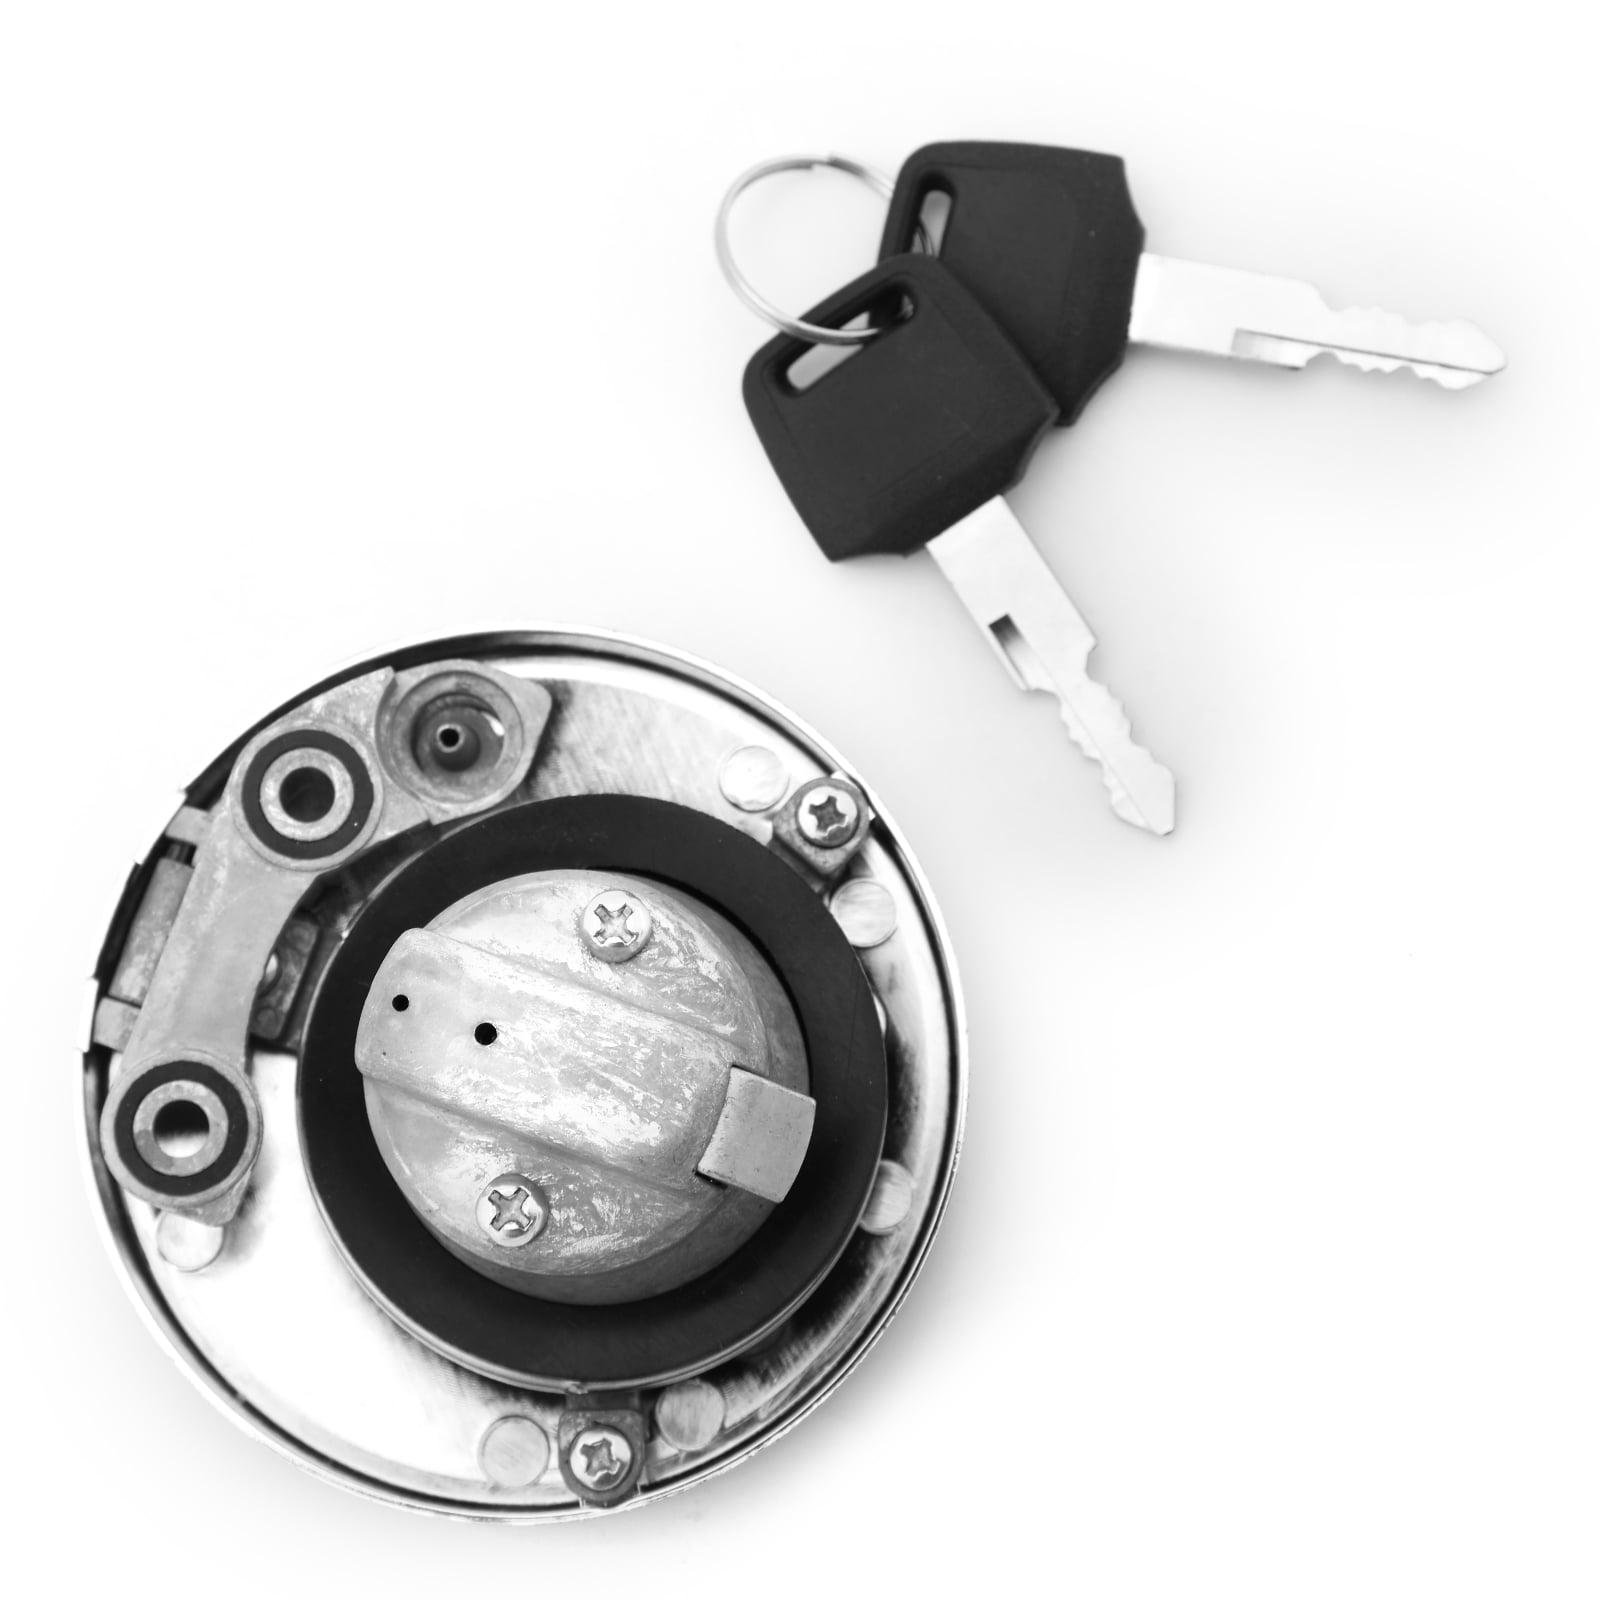 For Kawasaki VN800 Vulcan 800 EN500 Vulcan 500 VN1500 Vulcan 1500 VN400 EJ400 EJ650 kawasaki w650 EJ800 VN1500 fuel cap vulcan key Gas Locking Cap Fuel Gas Tank Locking Cap Lid Cover Keys